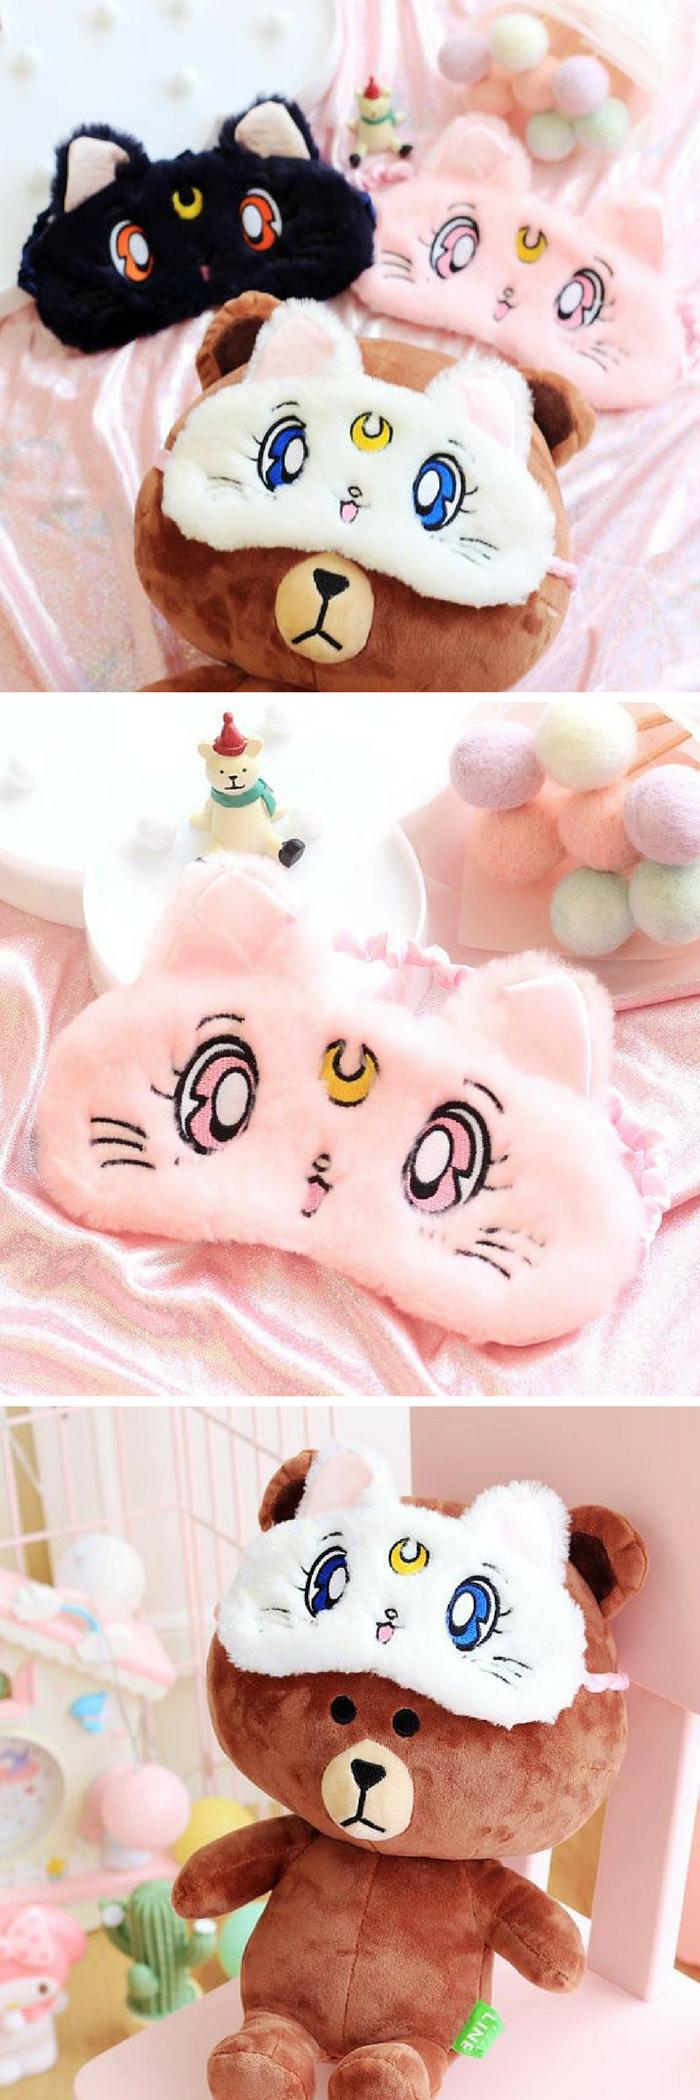 Costumes & Accessories Novelty & Special Use Sailor Moon Warrior Luna Cat Plush Eye Mask Anime Glossy Eye Shade Sleep Goggles Cartoon Shading Cat Eye Mask